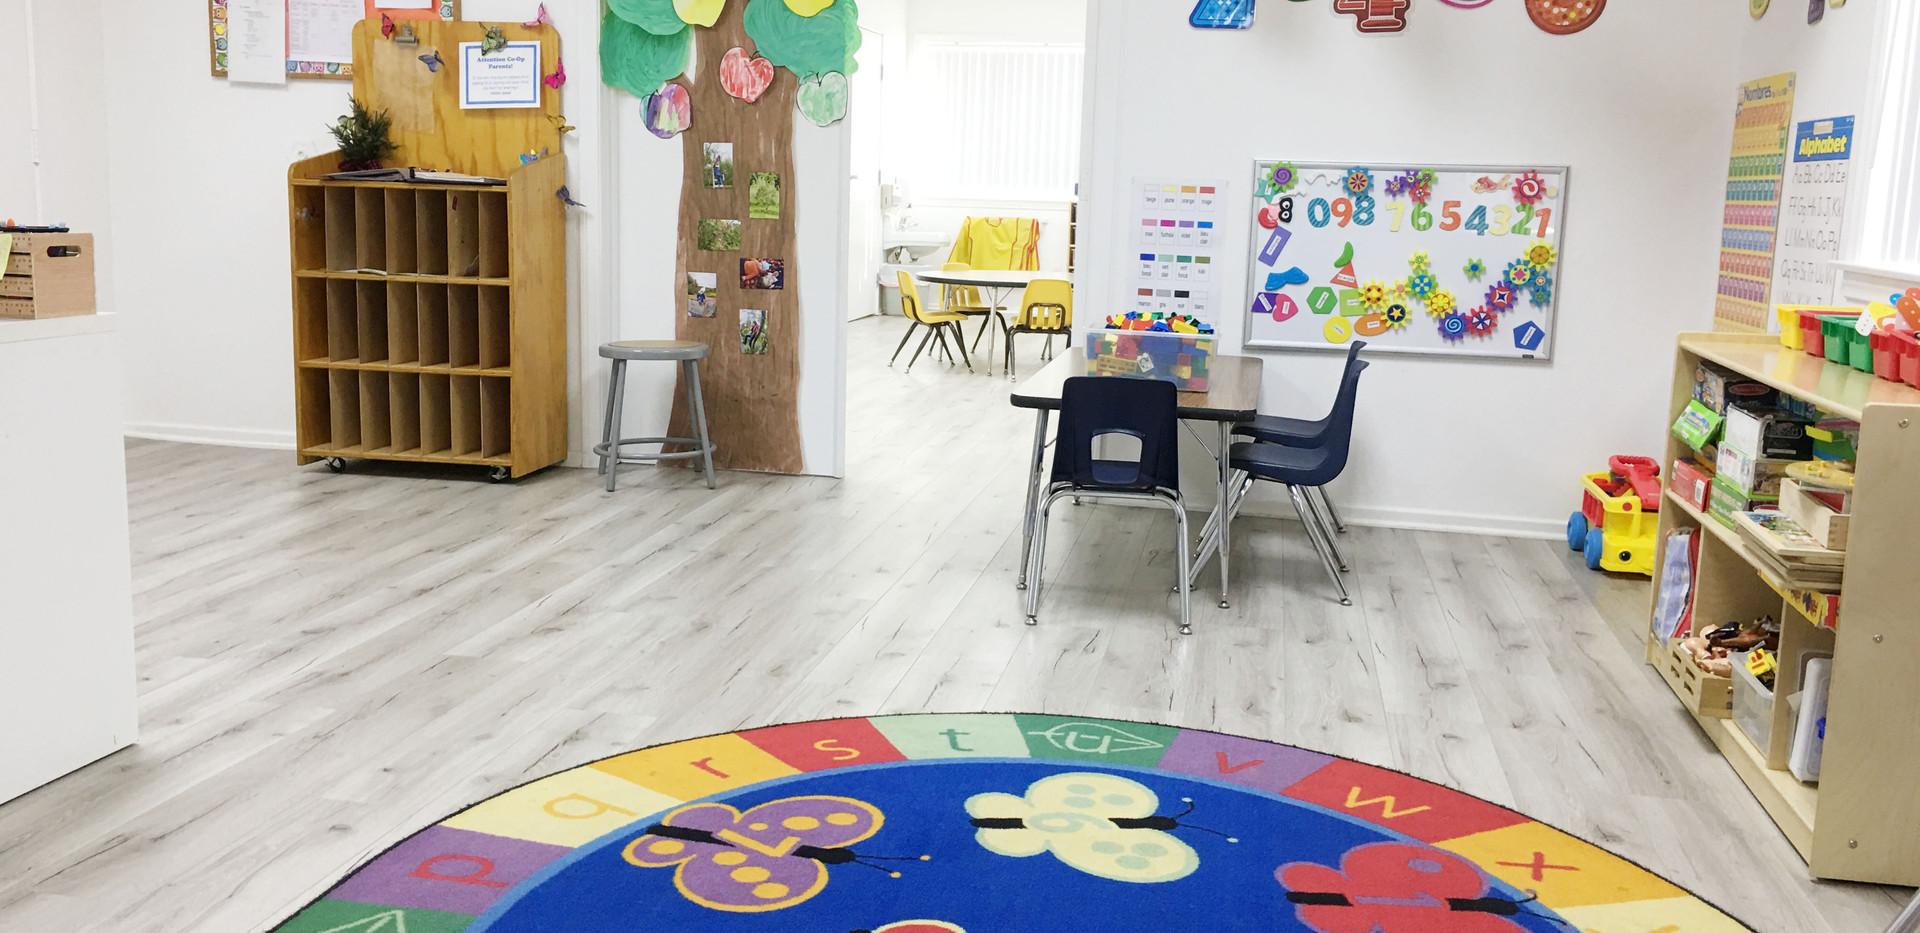 facilities_0027_IMG_0610.JPG.jpg